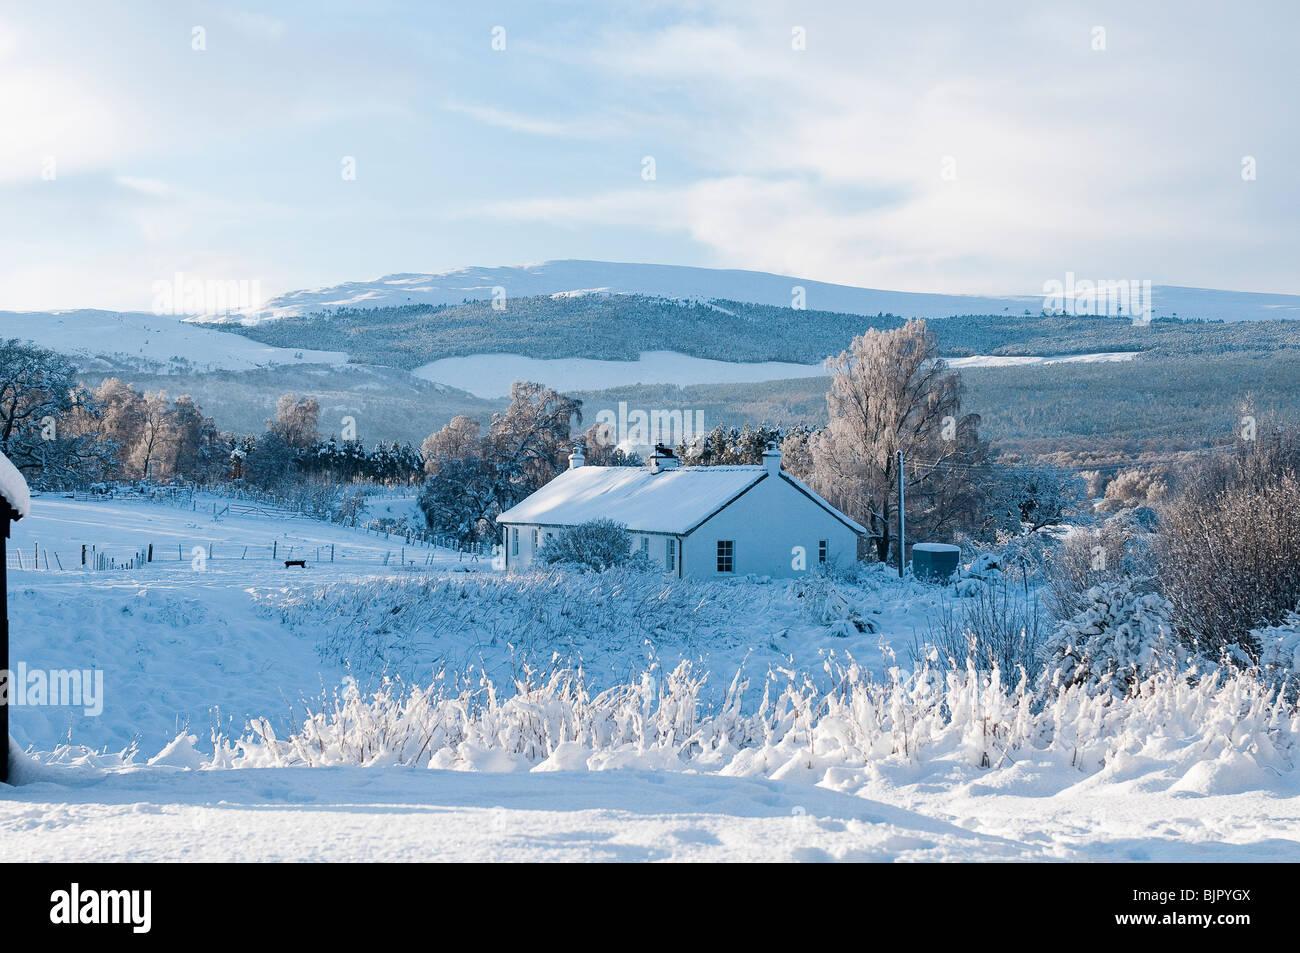 Croft in a snowy highland landscape, Scotland - Stock Image